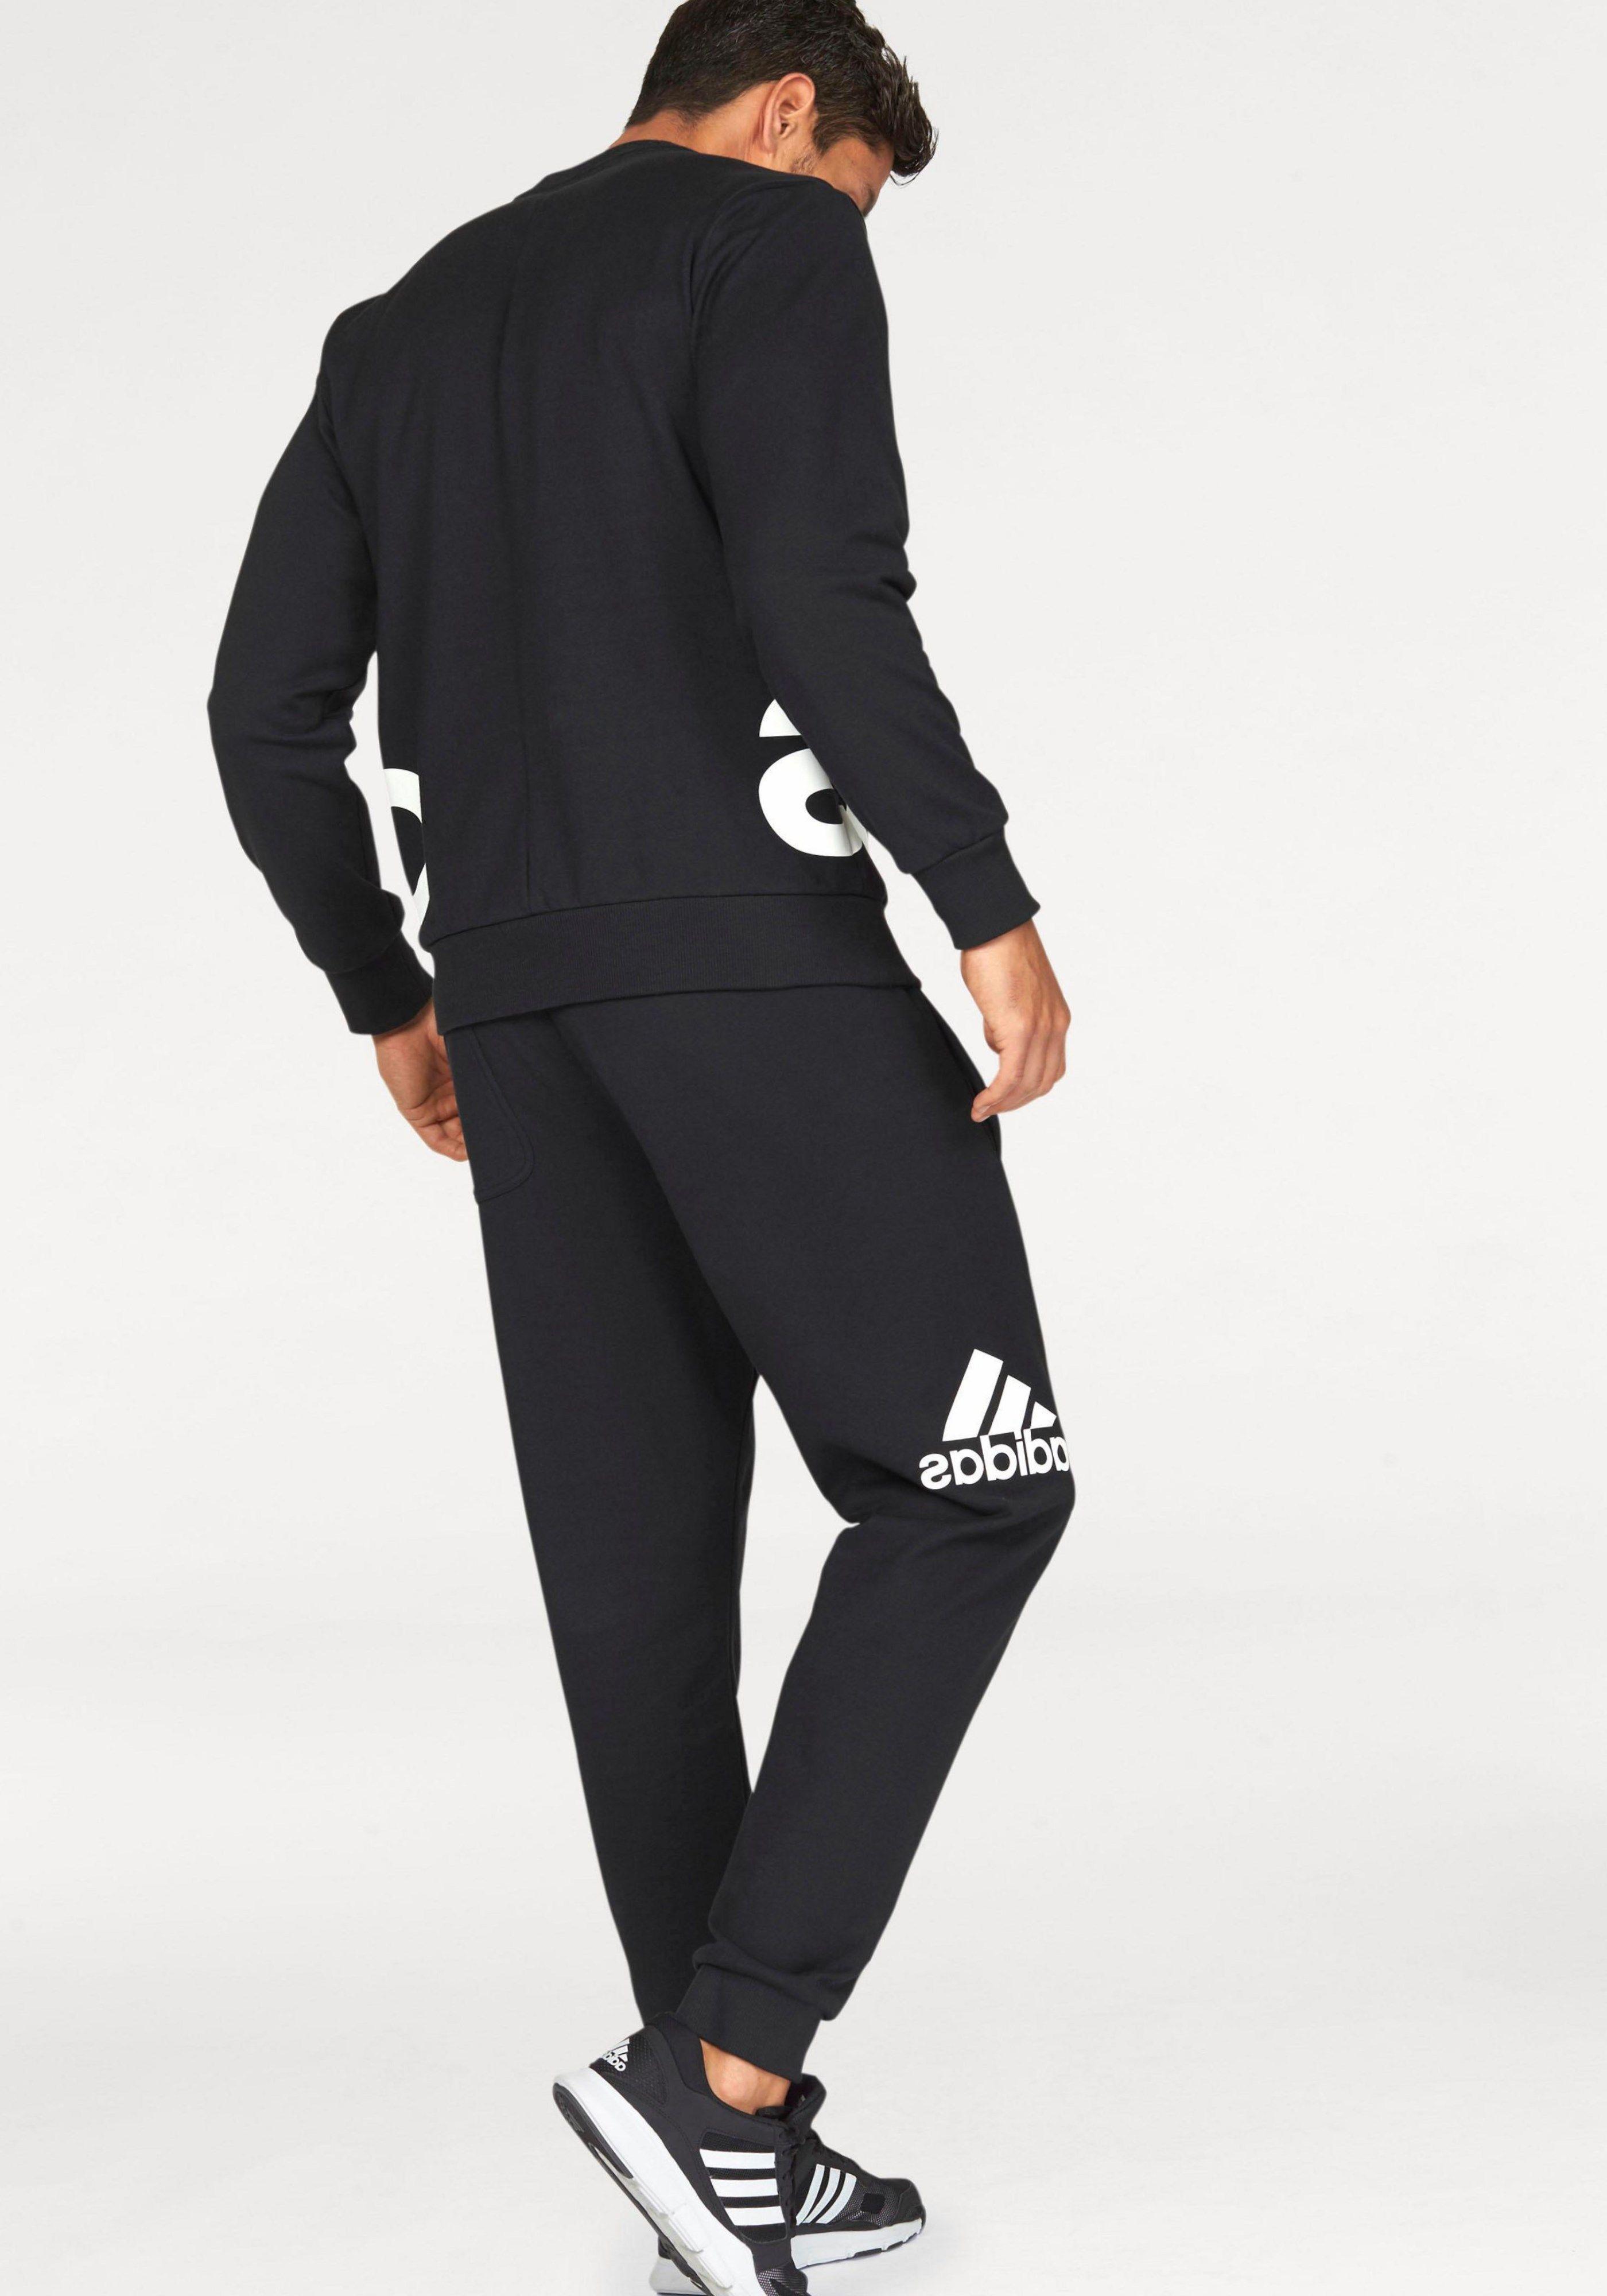 Adidas jogginganzug. | Jogginganzug, Anzug, Trainingsanzug